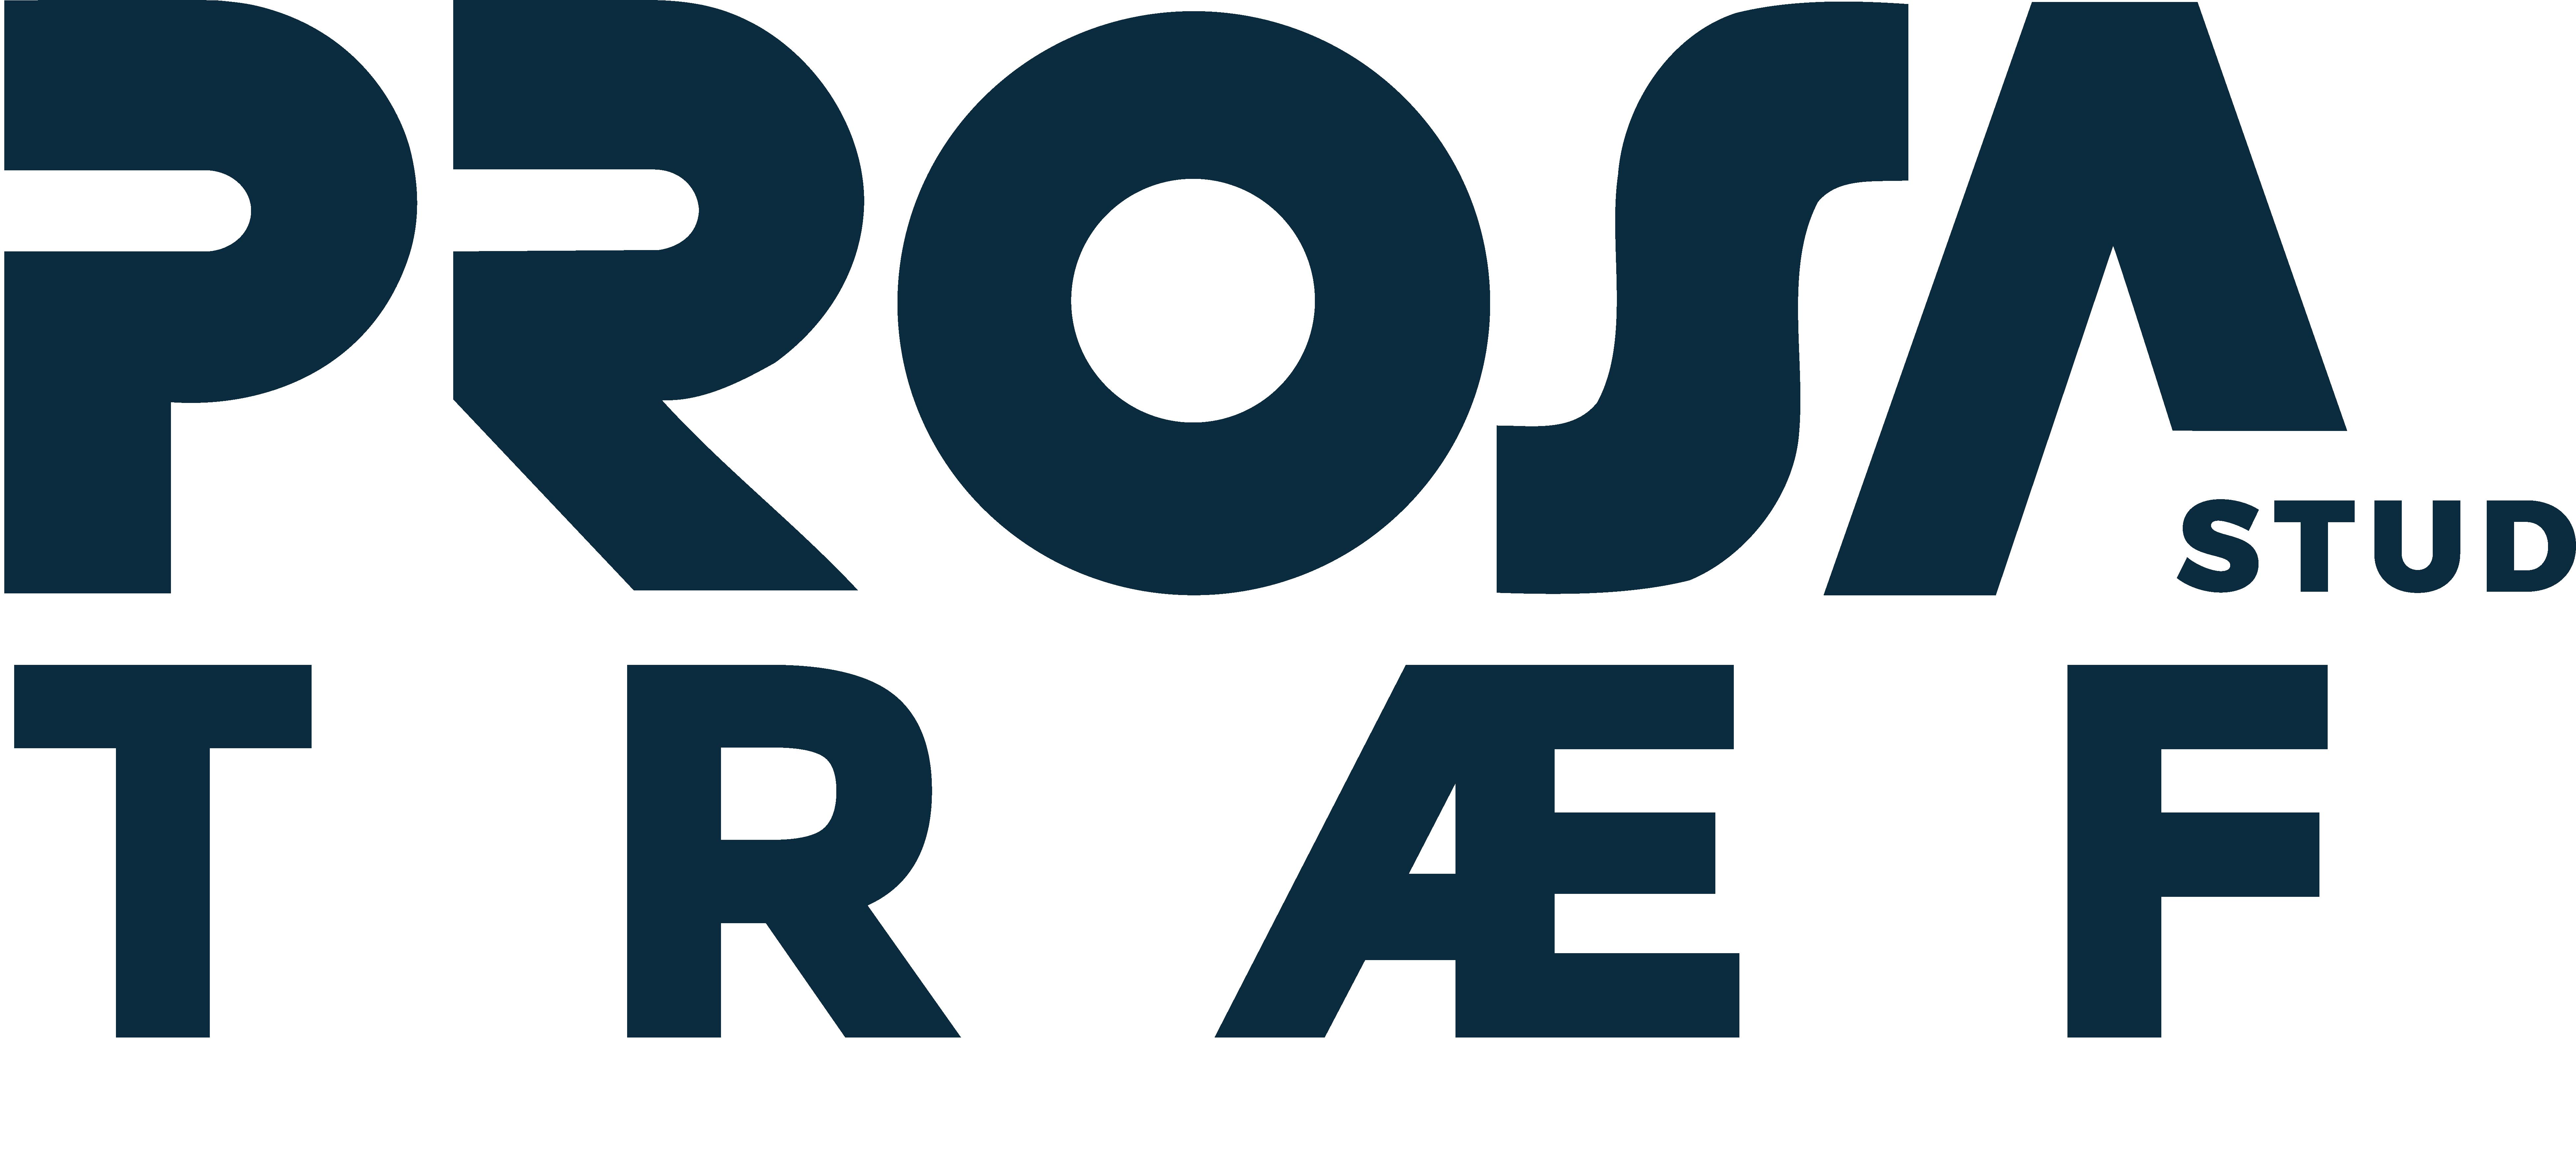 STUDtræf-logo